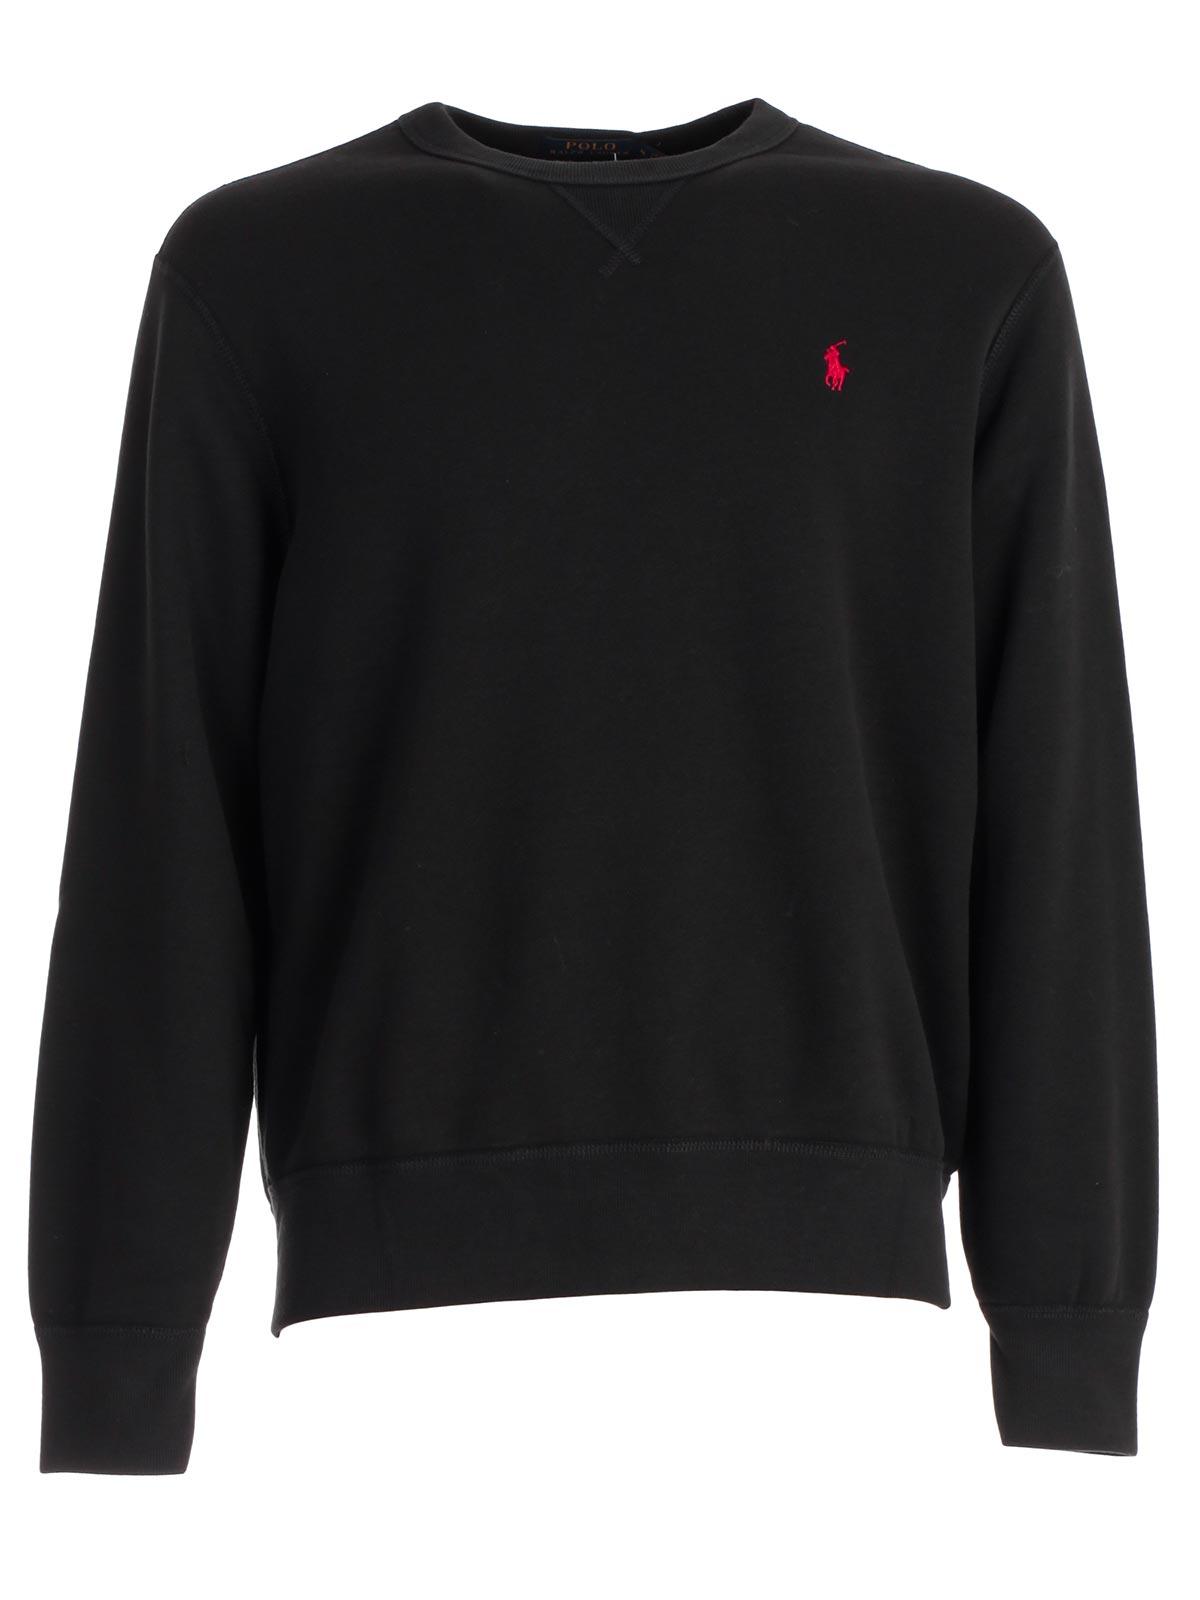 2b17d1903 Polo Ralph Lauren Sweatshirt 710.717112.003 - POLO BLACK.Bernardelli ...